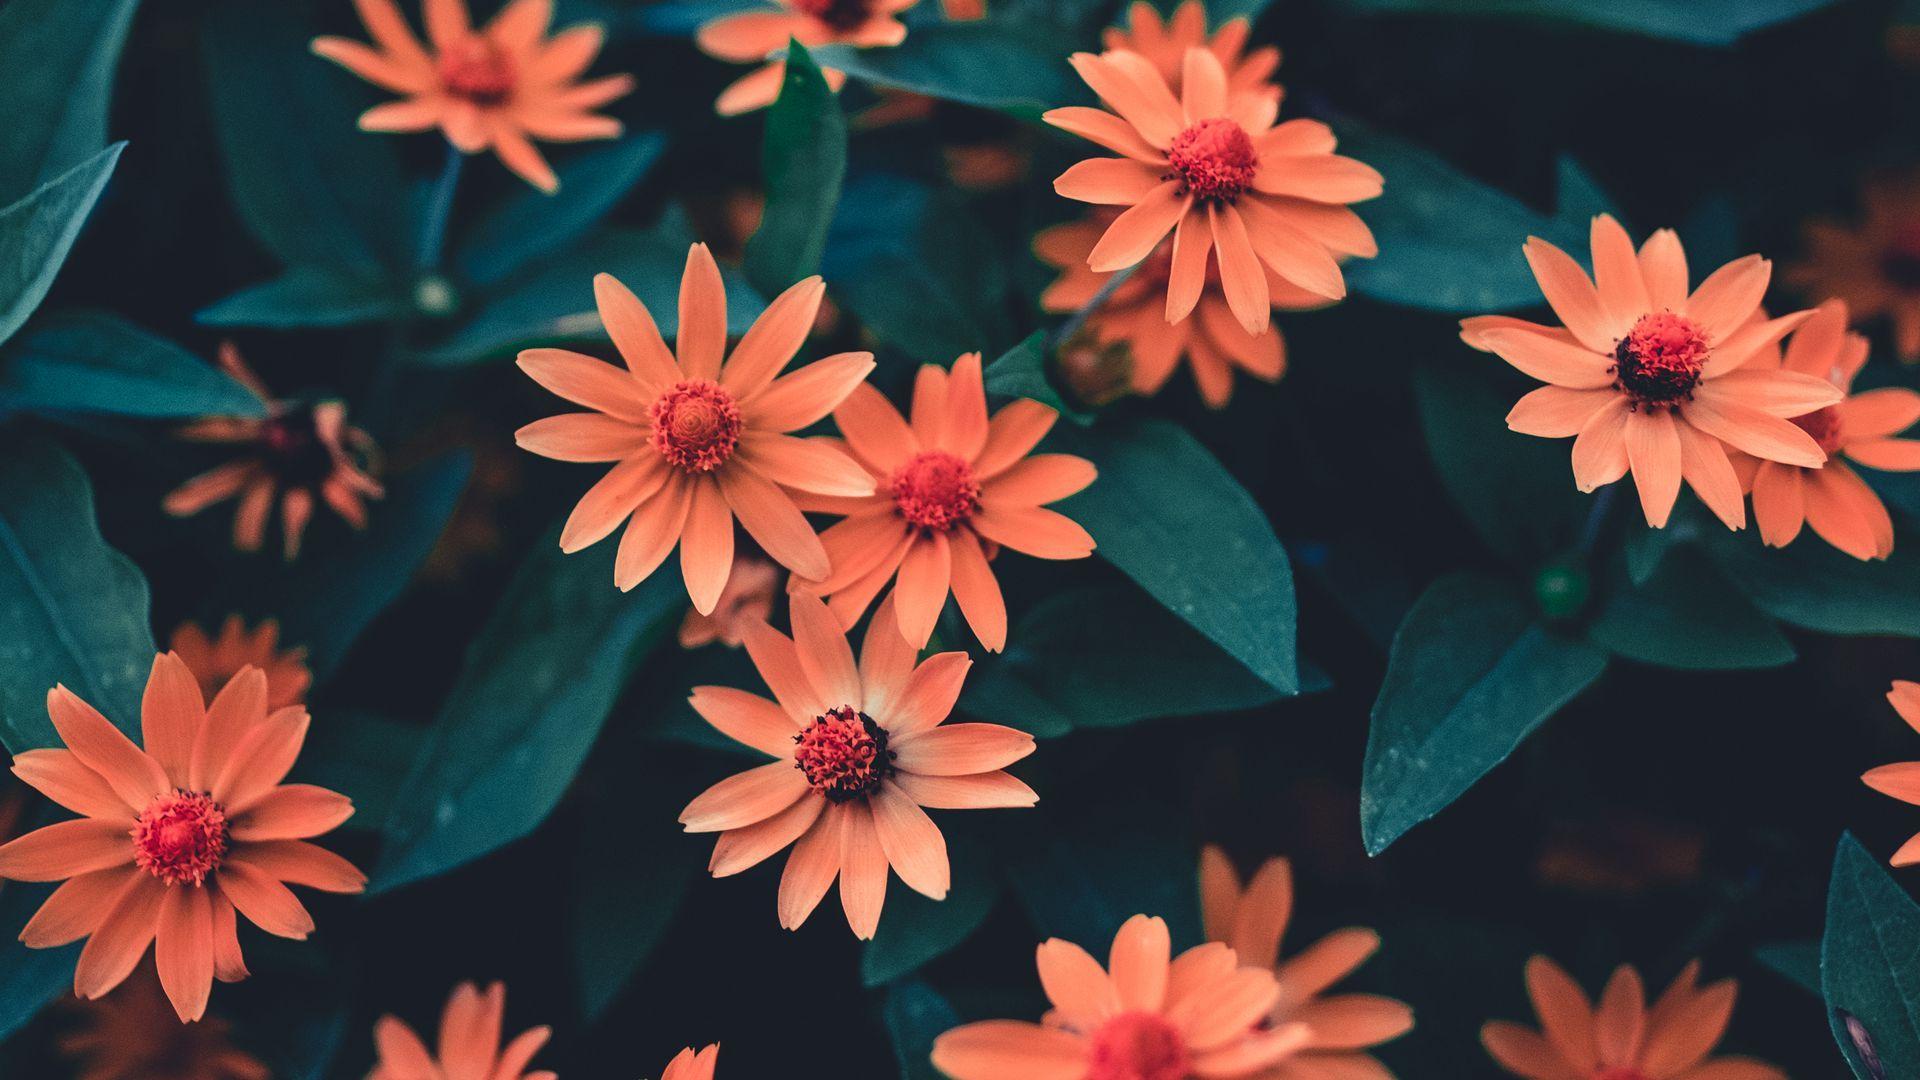 Beautiful Aesthetic Flowers Wallpaper